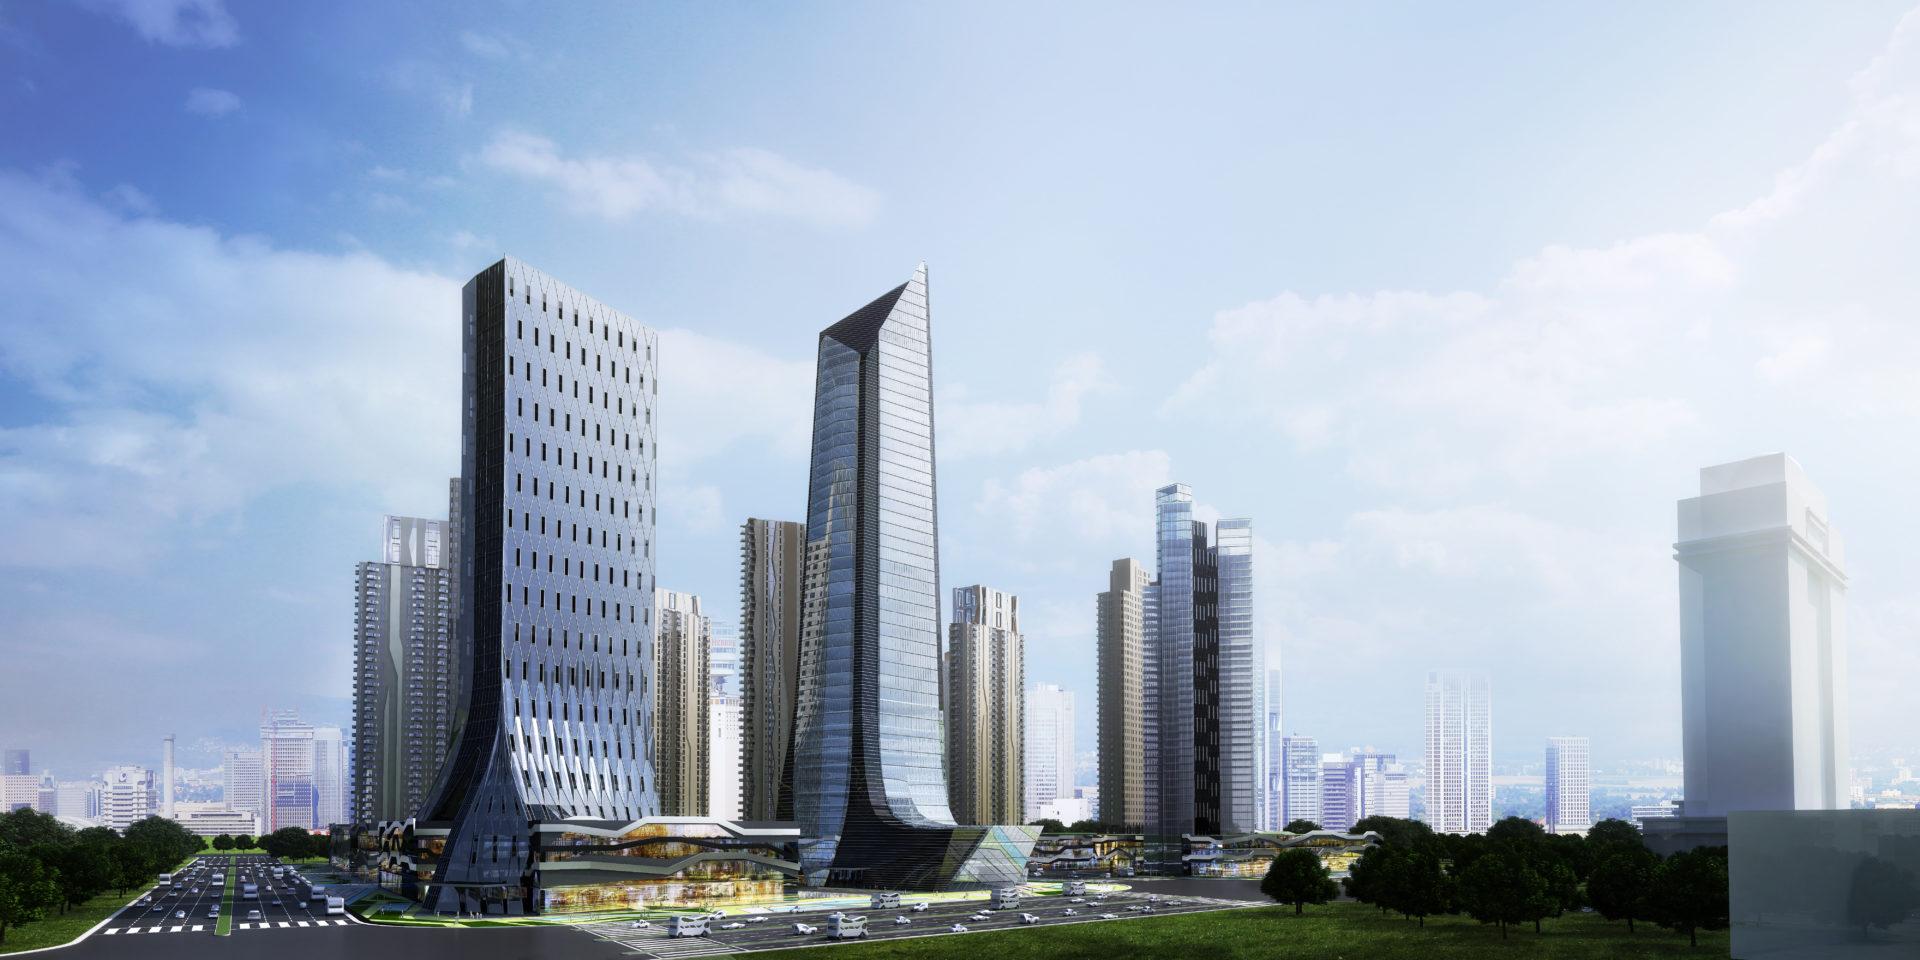 Linca Centre of Fujian 02